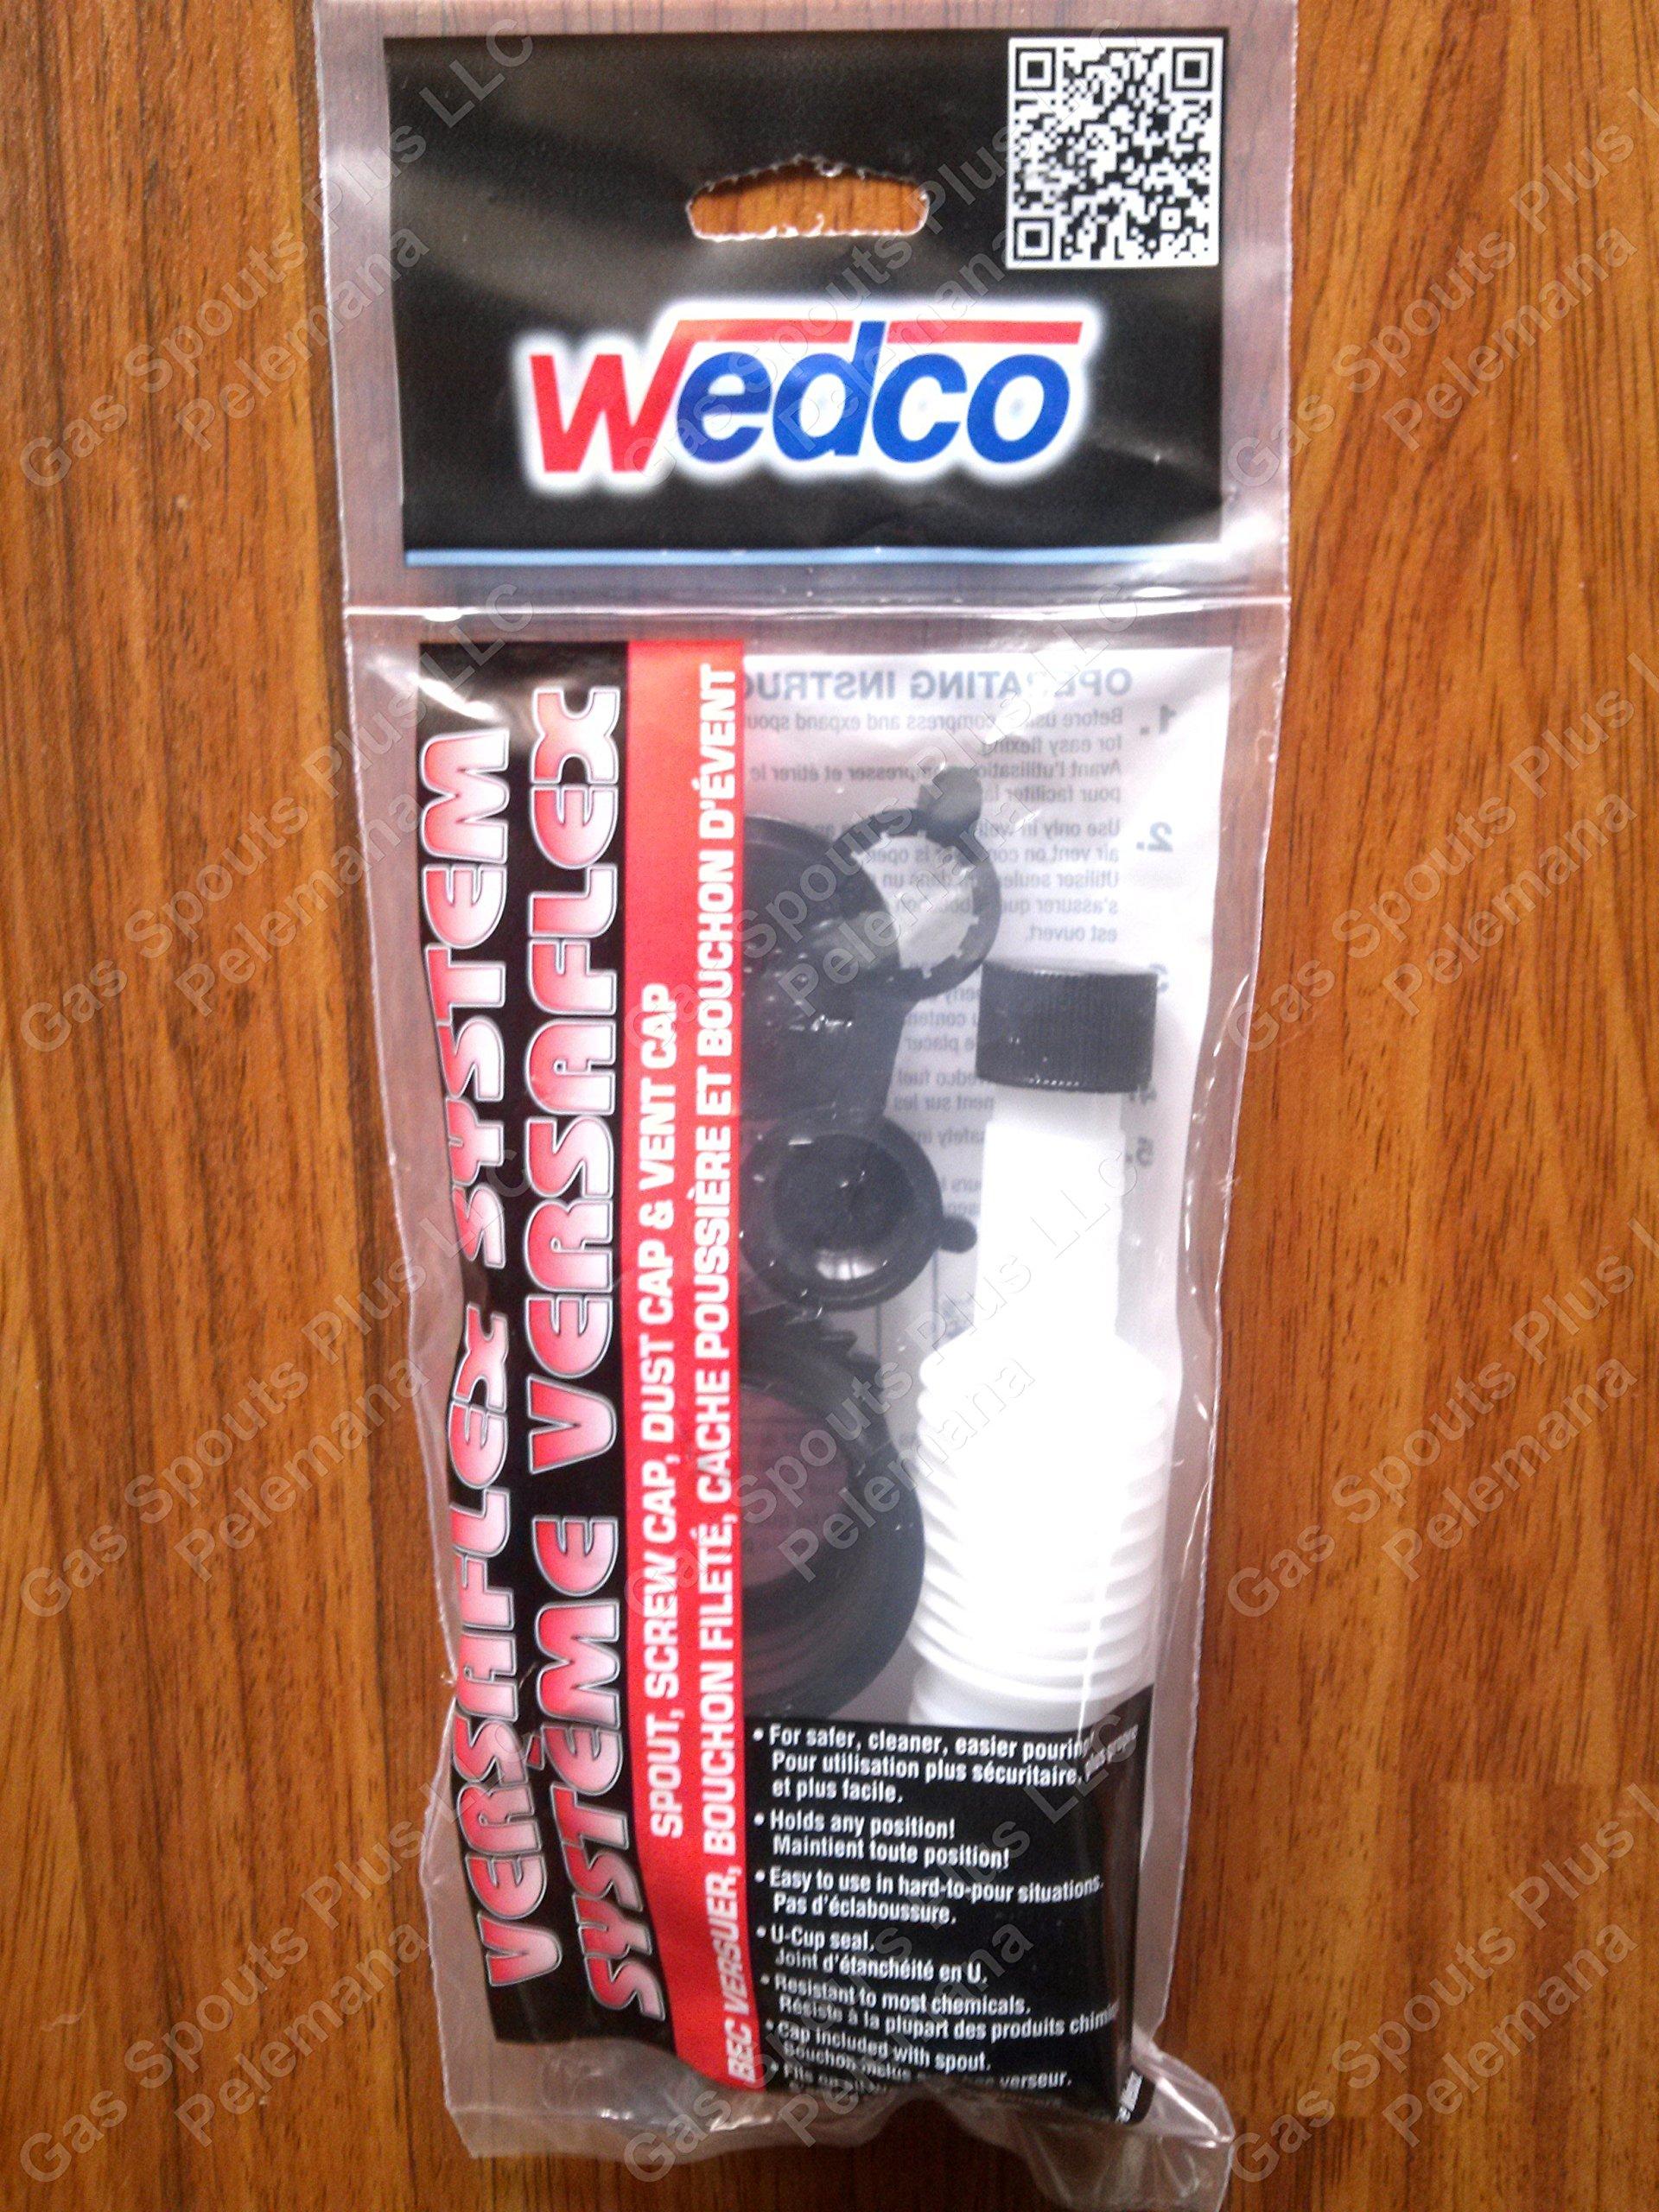 1-Package (ONE) Wedco / Briggs & Stratton Versaflex Gas Spout & Parts System Kit incl Flexible Spout w/Gasket & Spout Cap 84060, Screw Cap Collar 84004CR, Stopper Seal Disc 84002 & Rear Vent Cap 84003